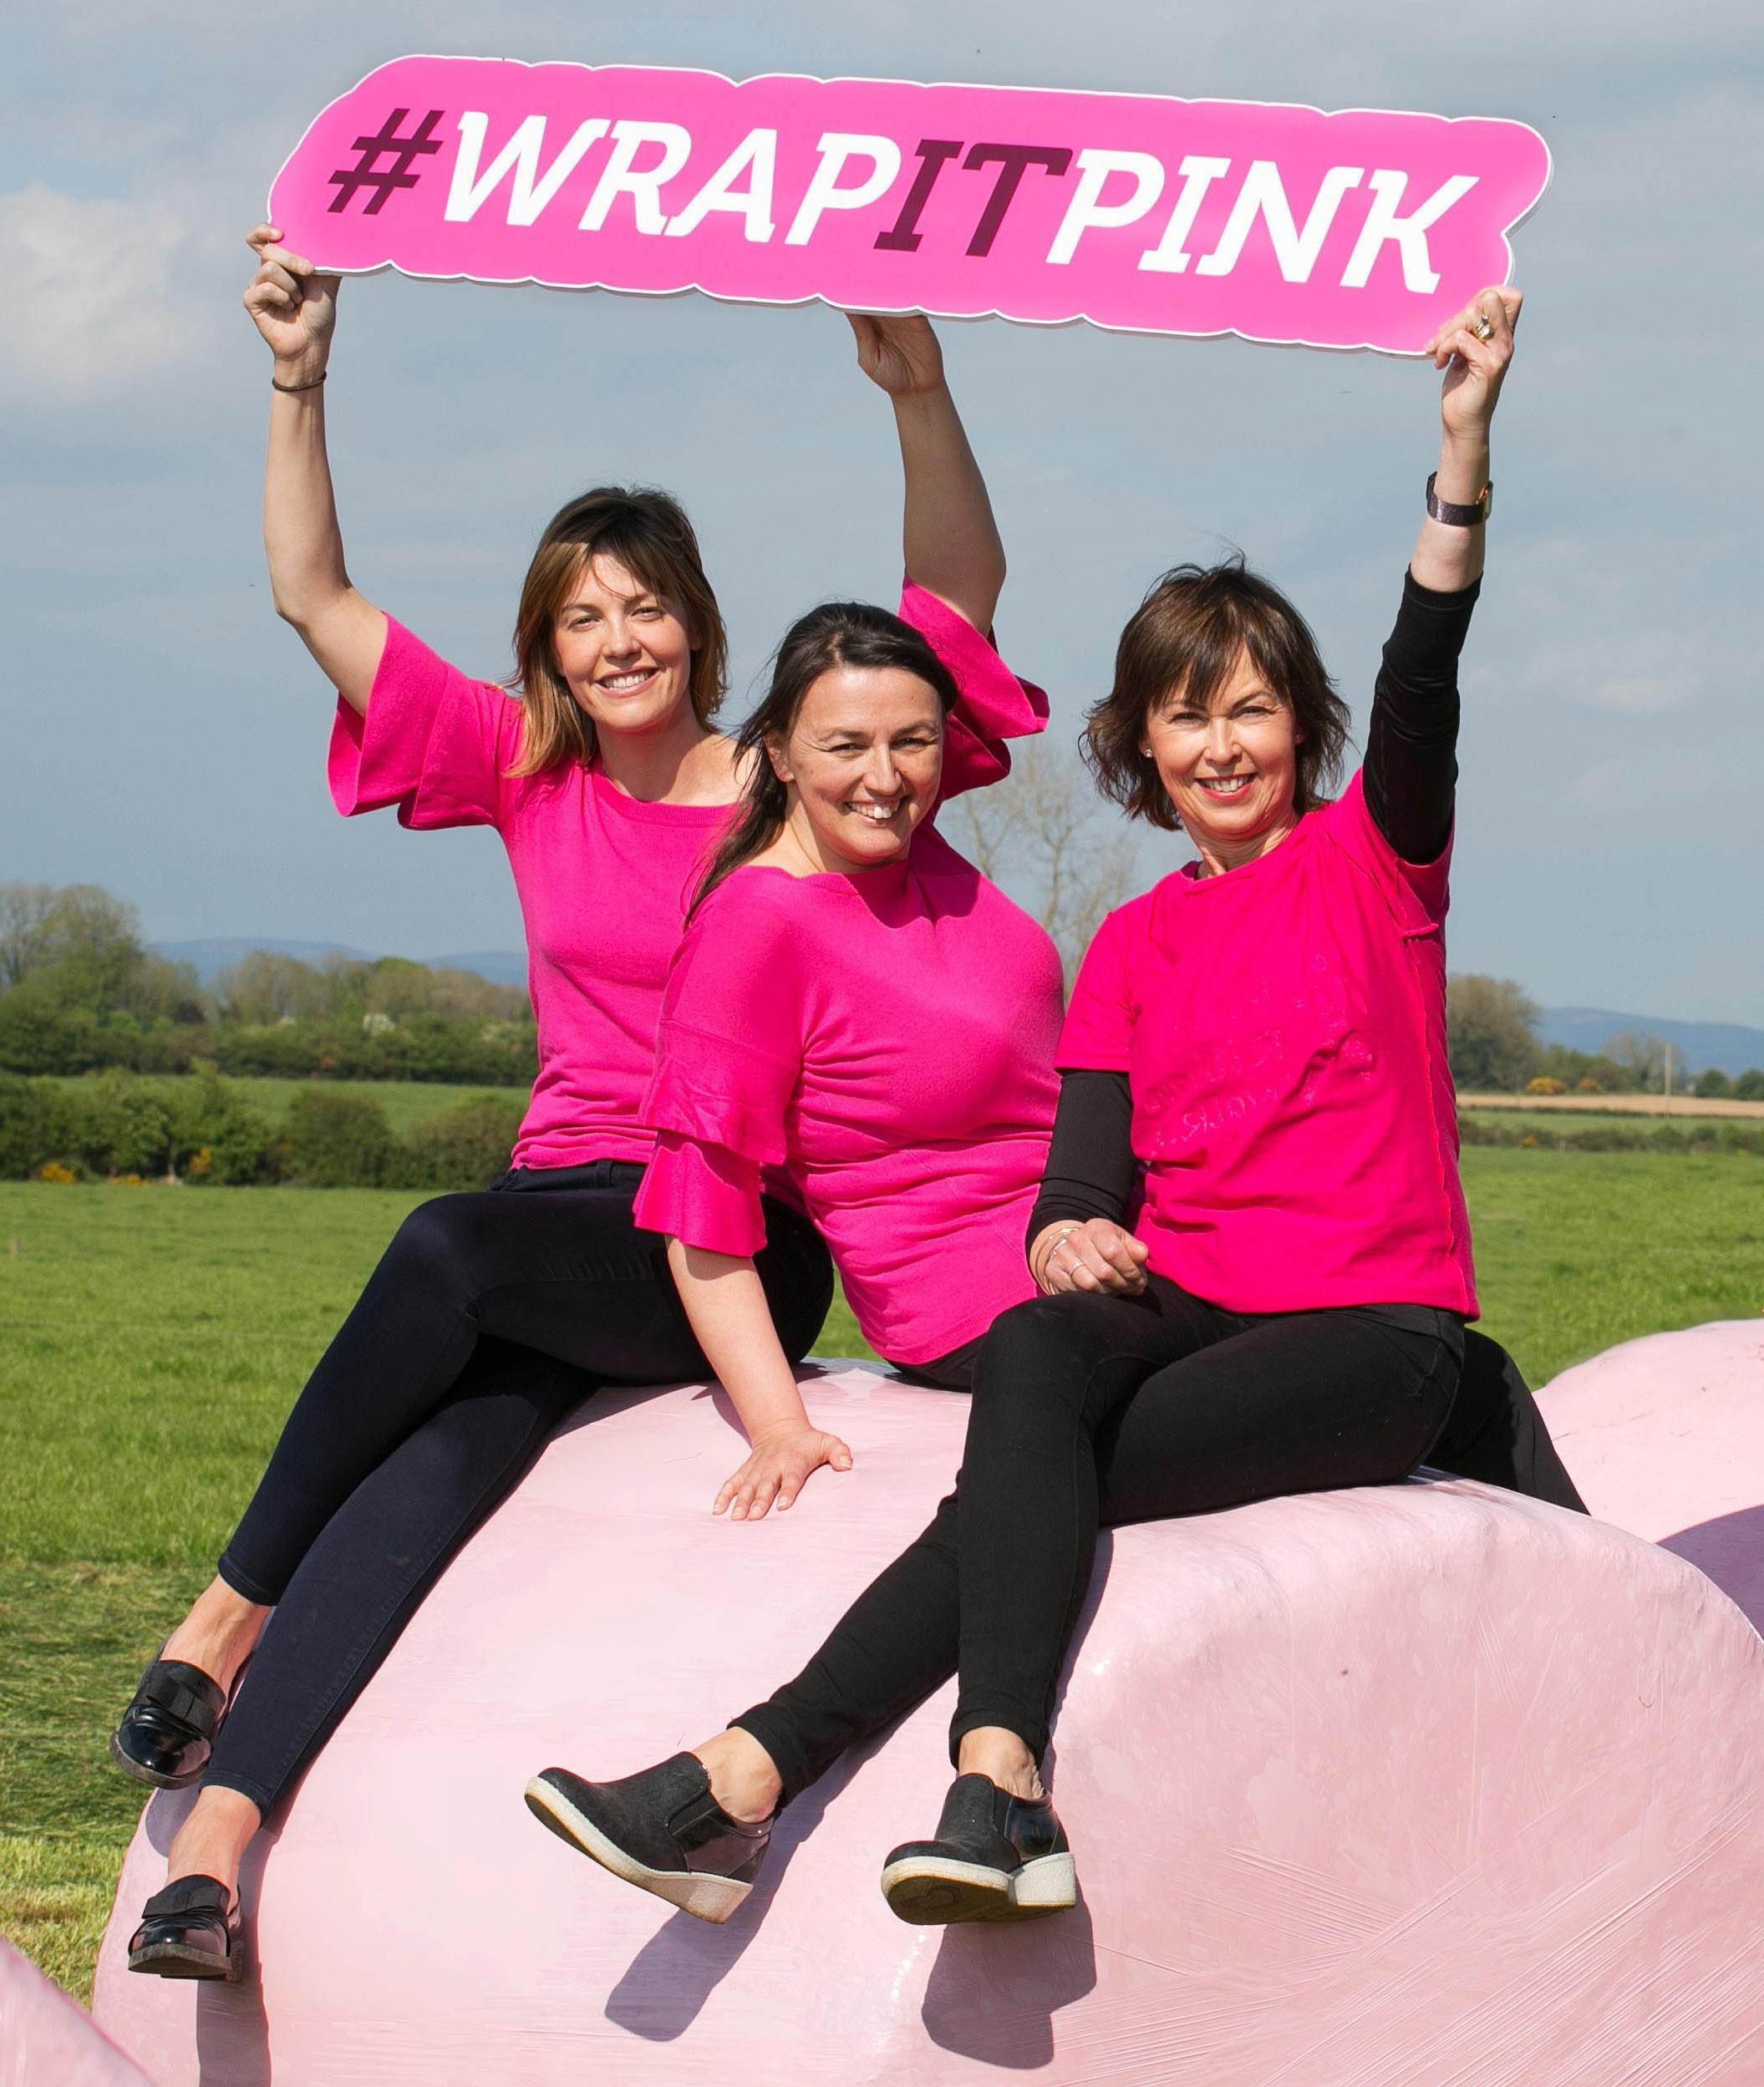 Wrap It Pink: Rural Ireland Turns Pink for Third Year Running!